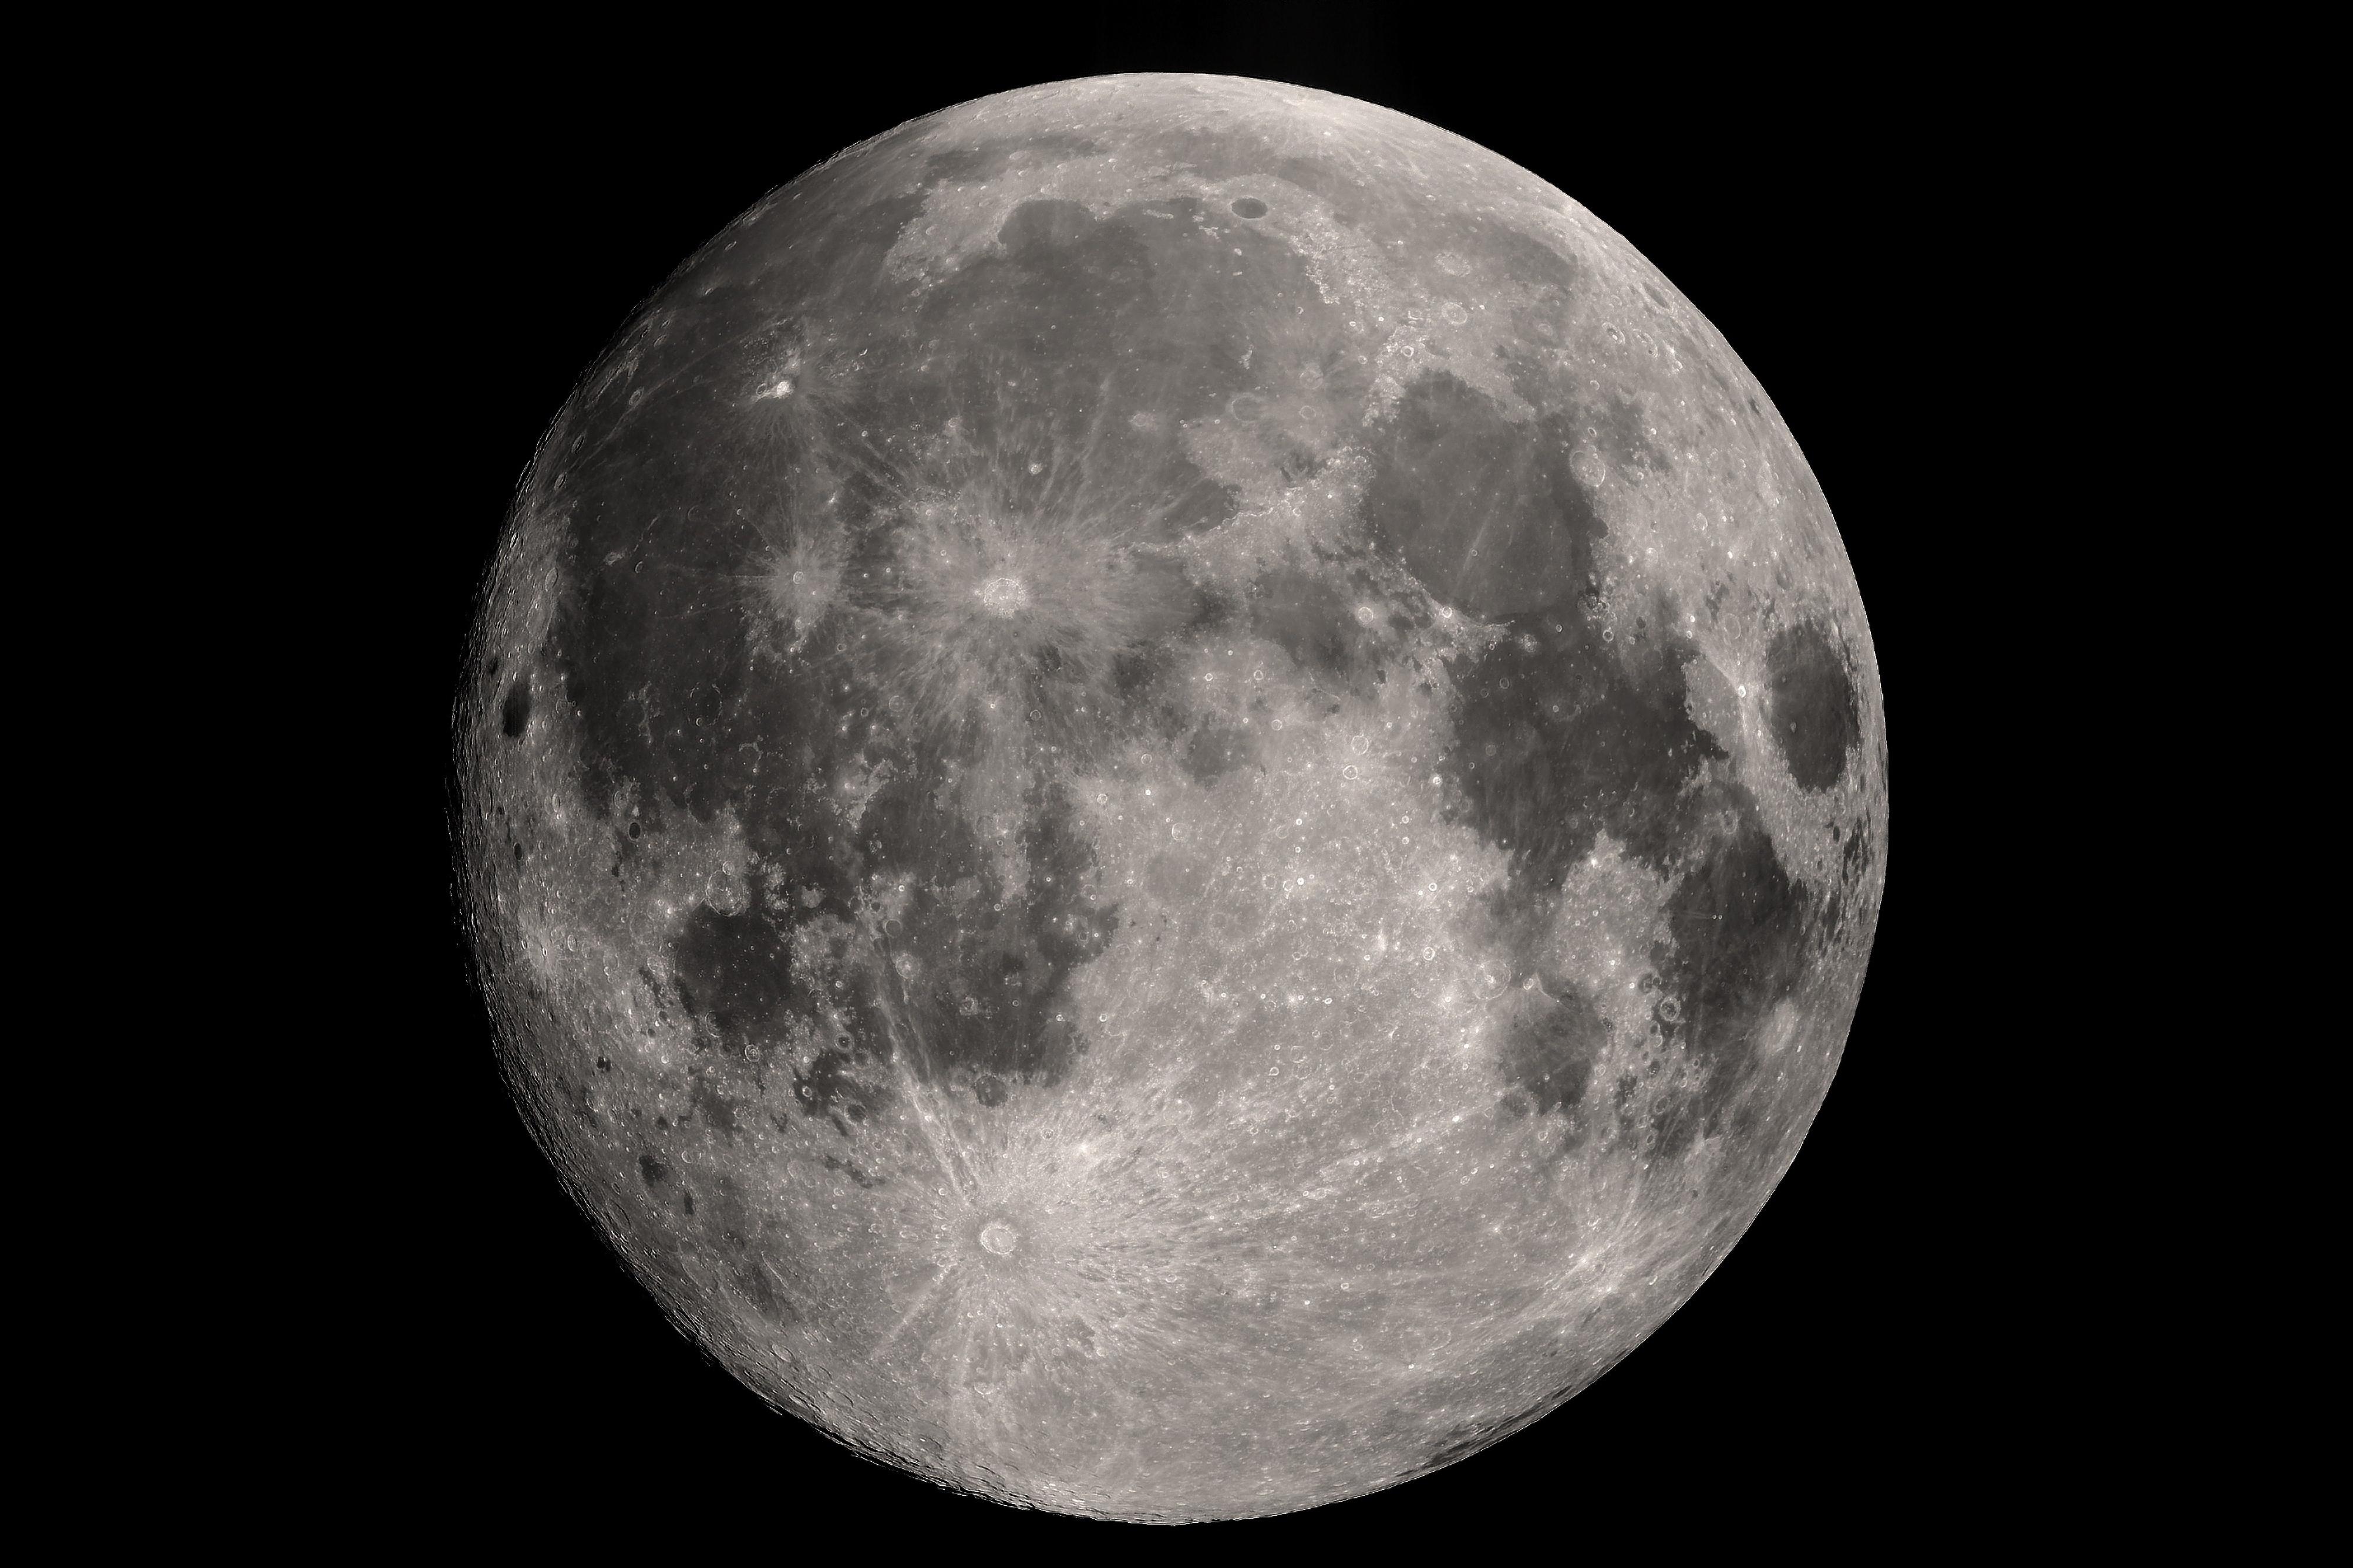 moon3pixi copy2.jpg